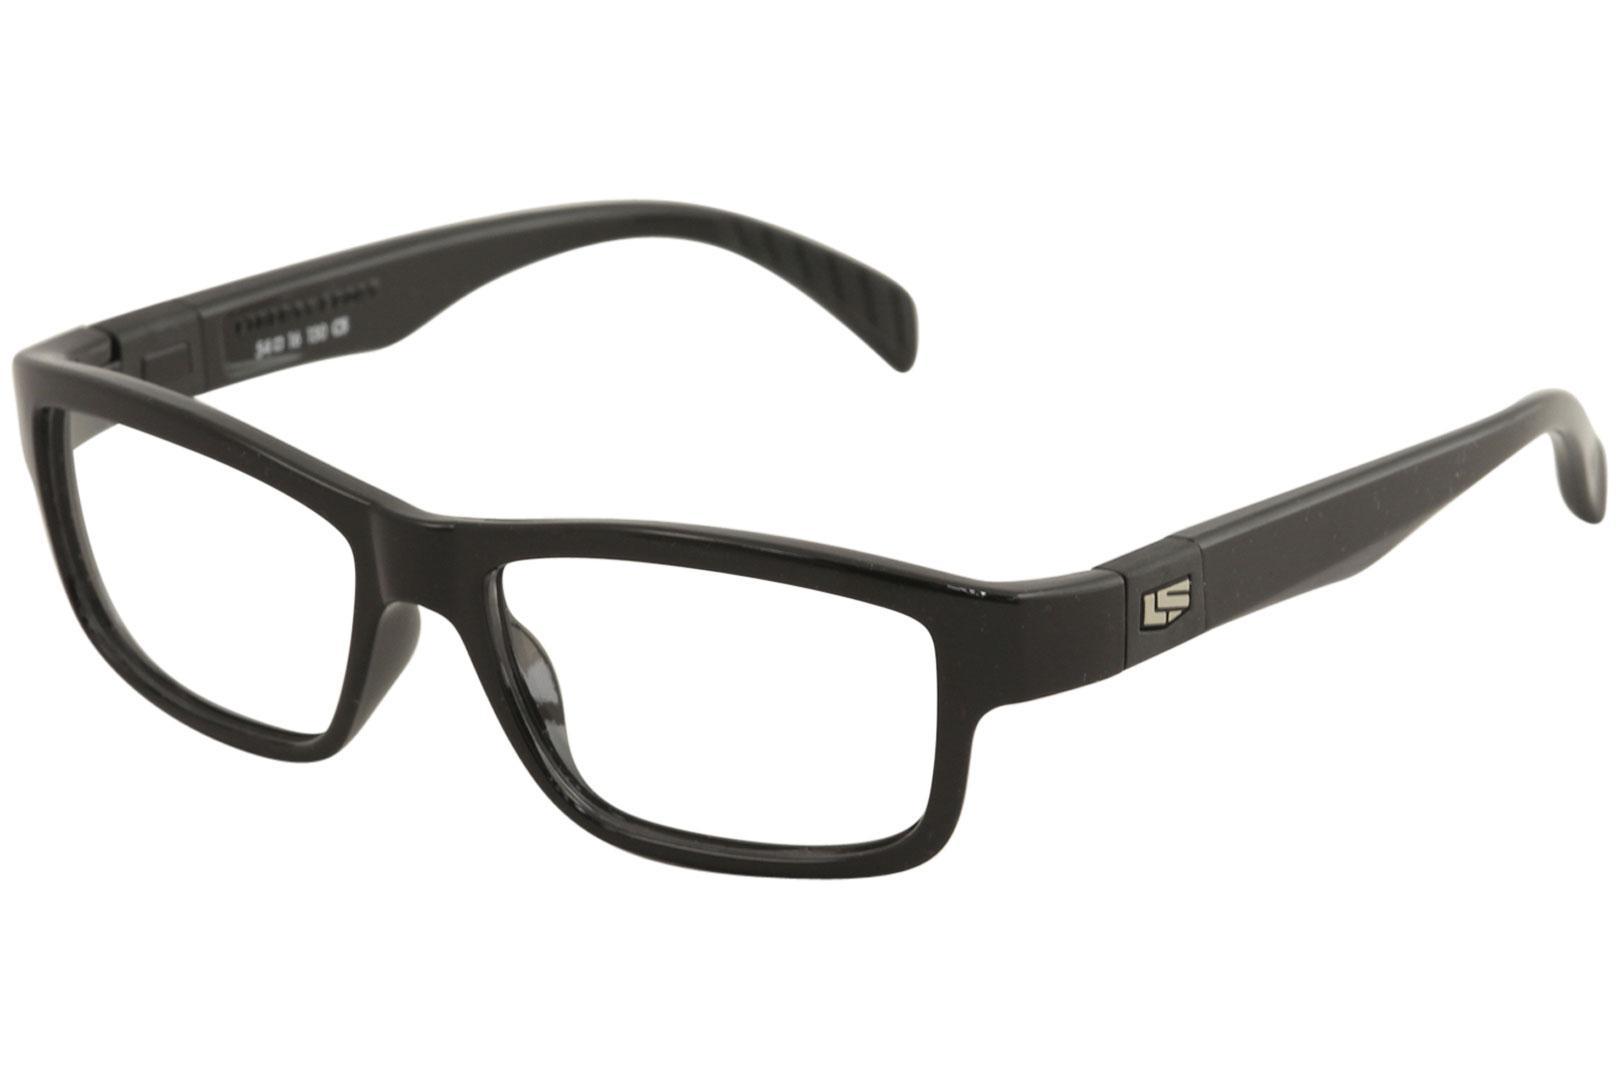 Image of Liberty Sport Men's Eyeglasses X8 100 Full Rim Optical Frame - Shiny Black   203 - Lens 54 Bridge 16 Temple 130mm